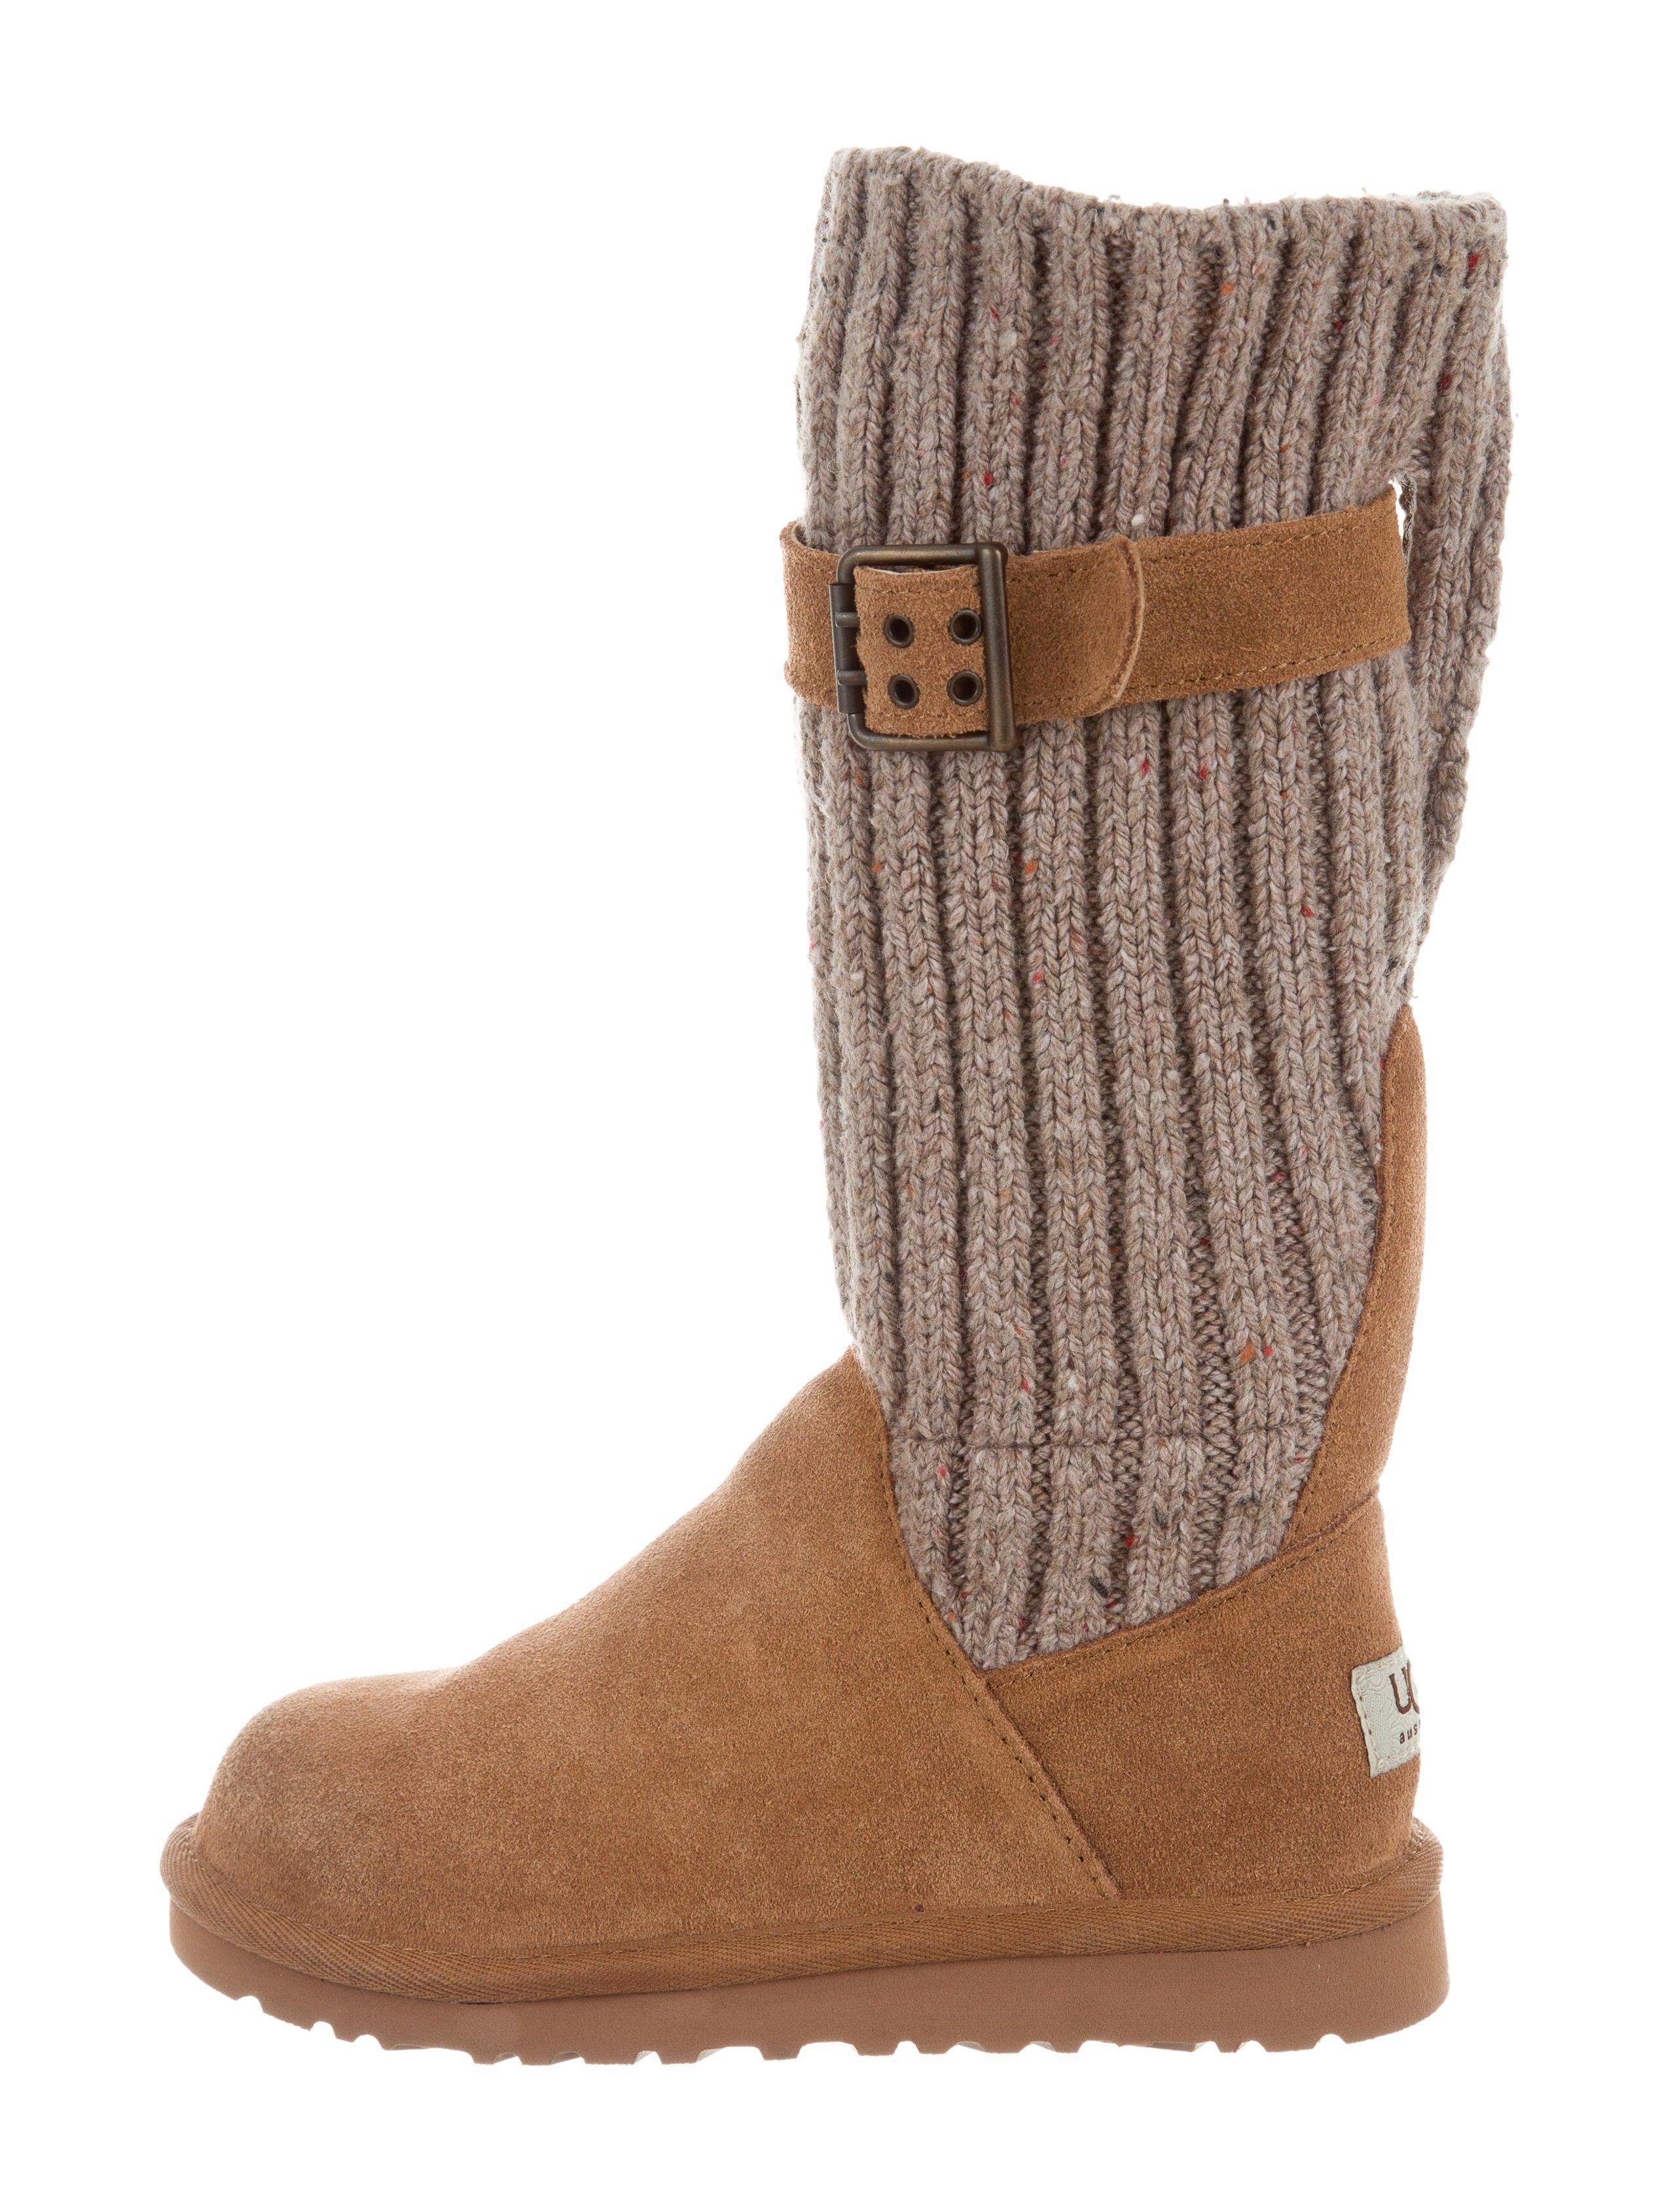 Knitting Websites Australia : Ugg australia girls cambridge knit boots